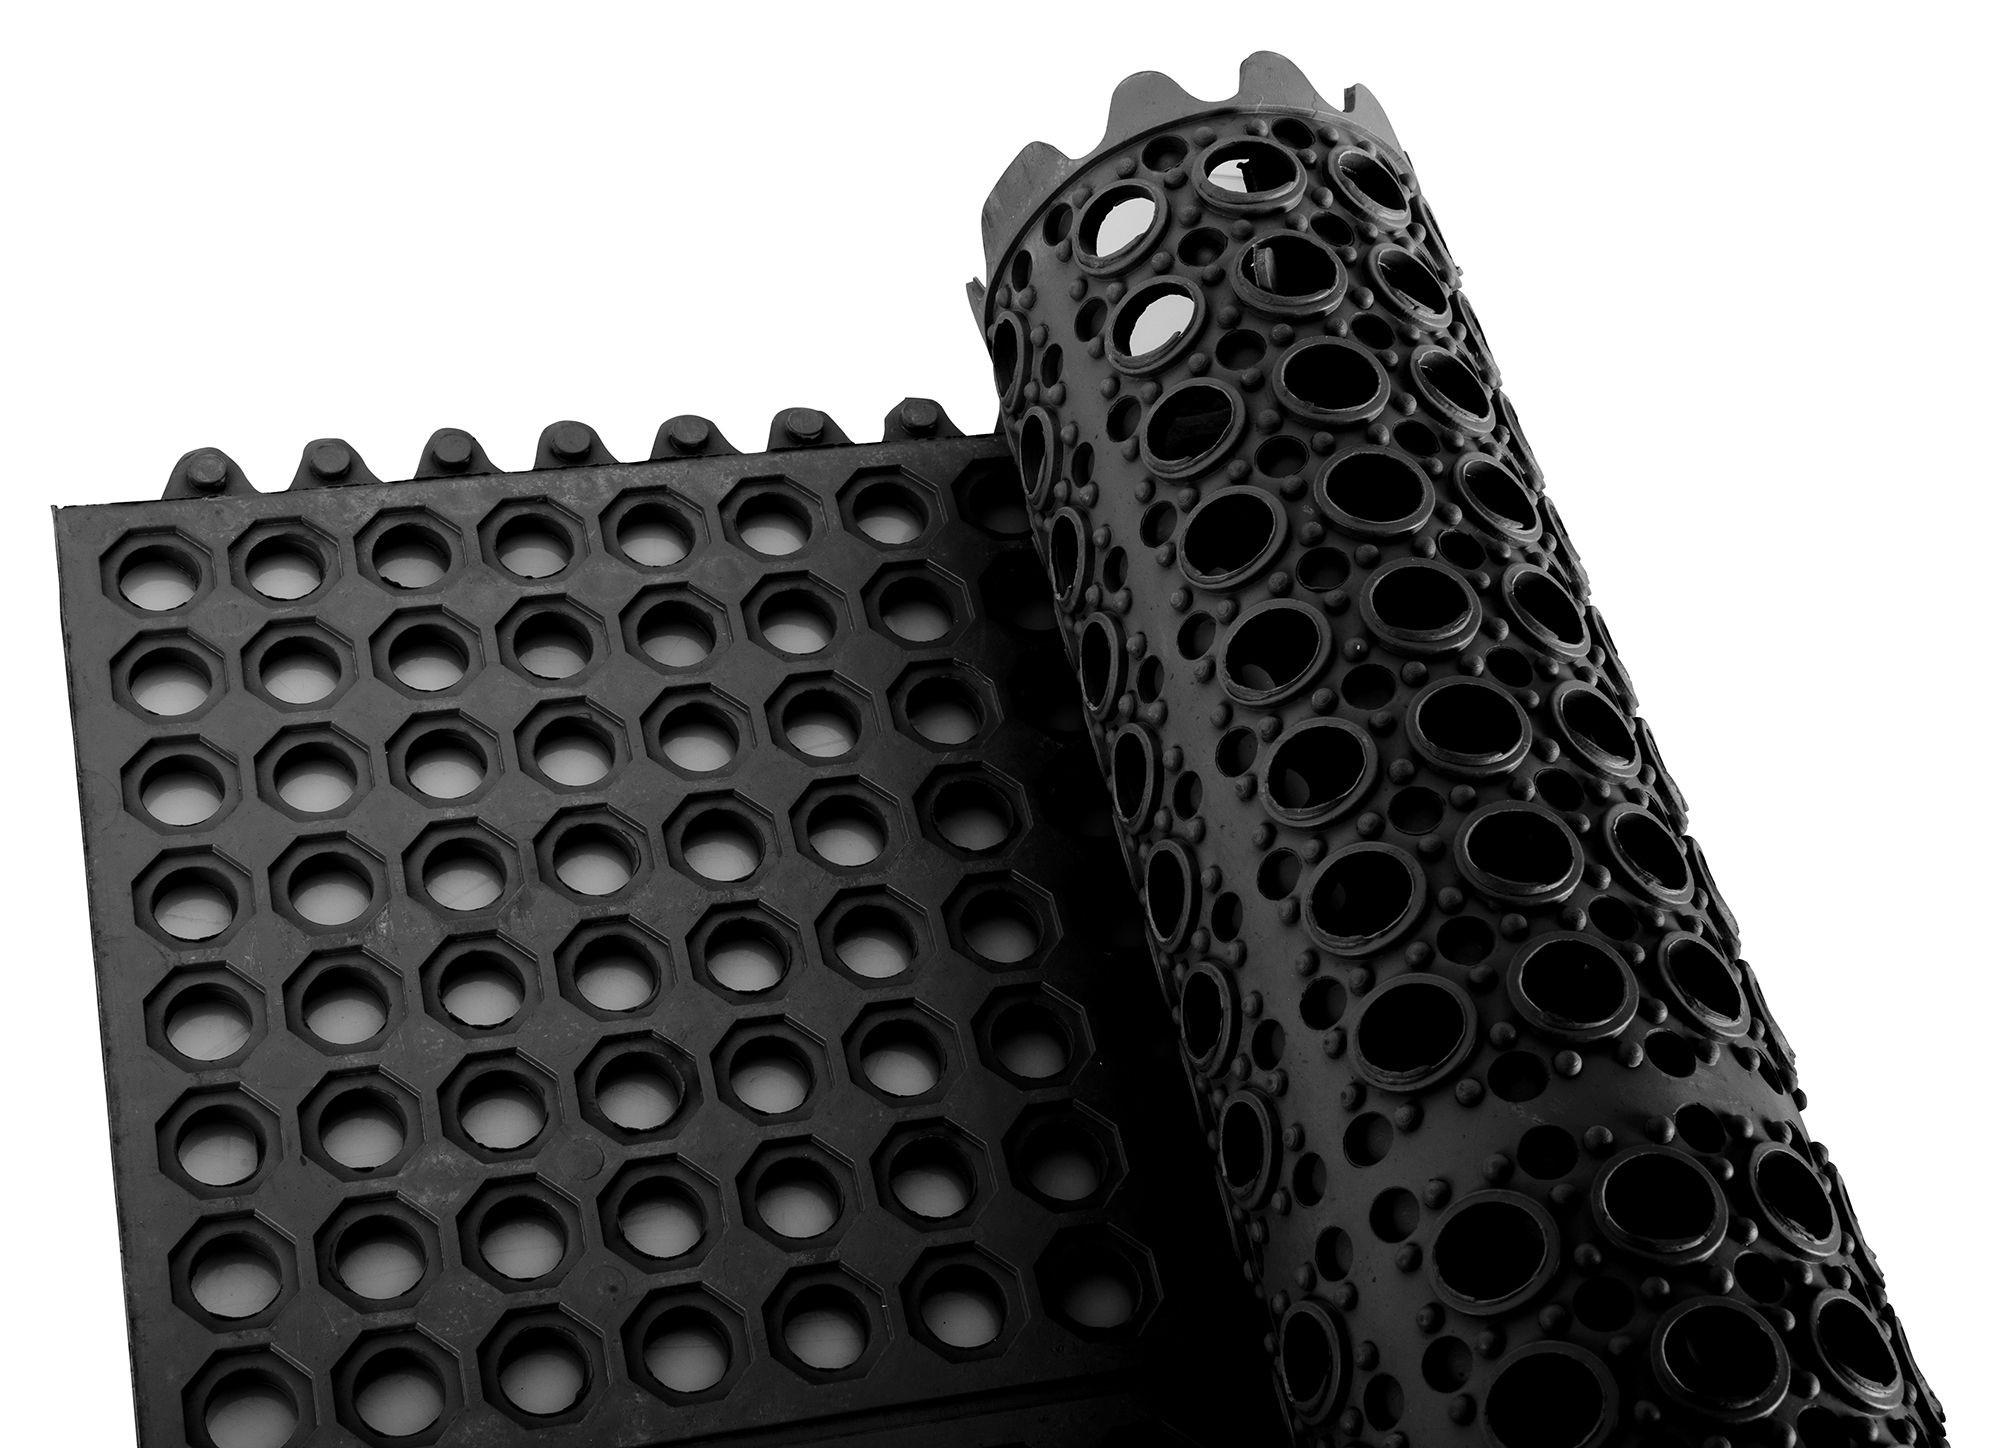 "Winco RBMI-33K Black Anti-Fatigue Interlocking Rubber Floor Mat 3"" x 3"" x 1/2"""